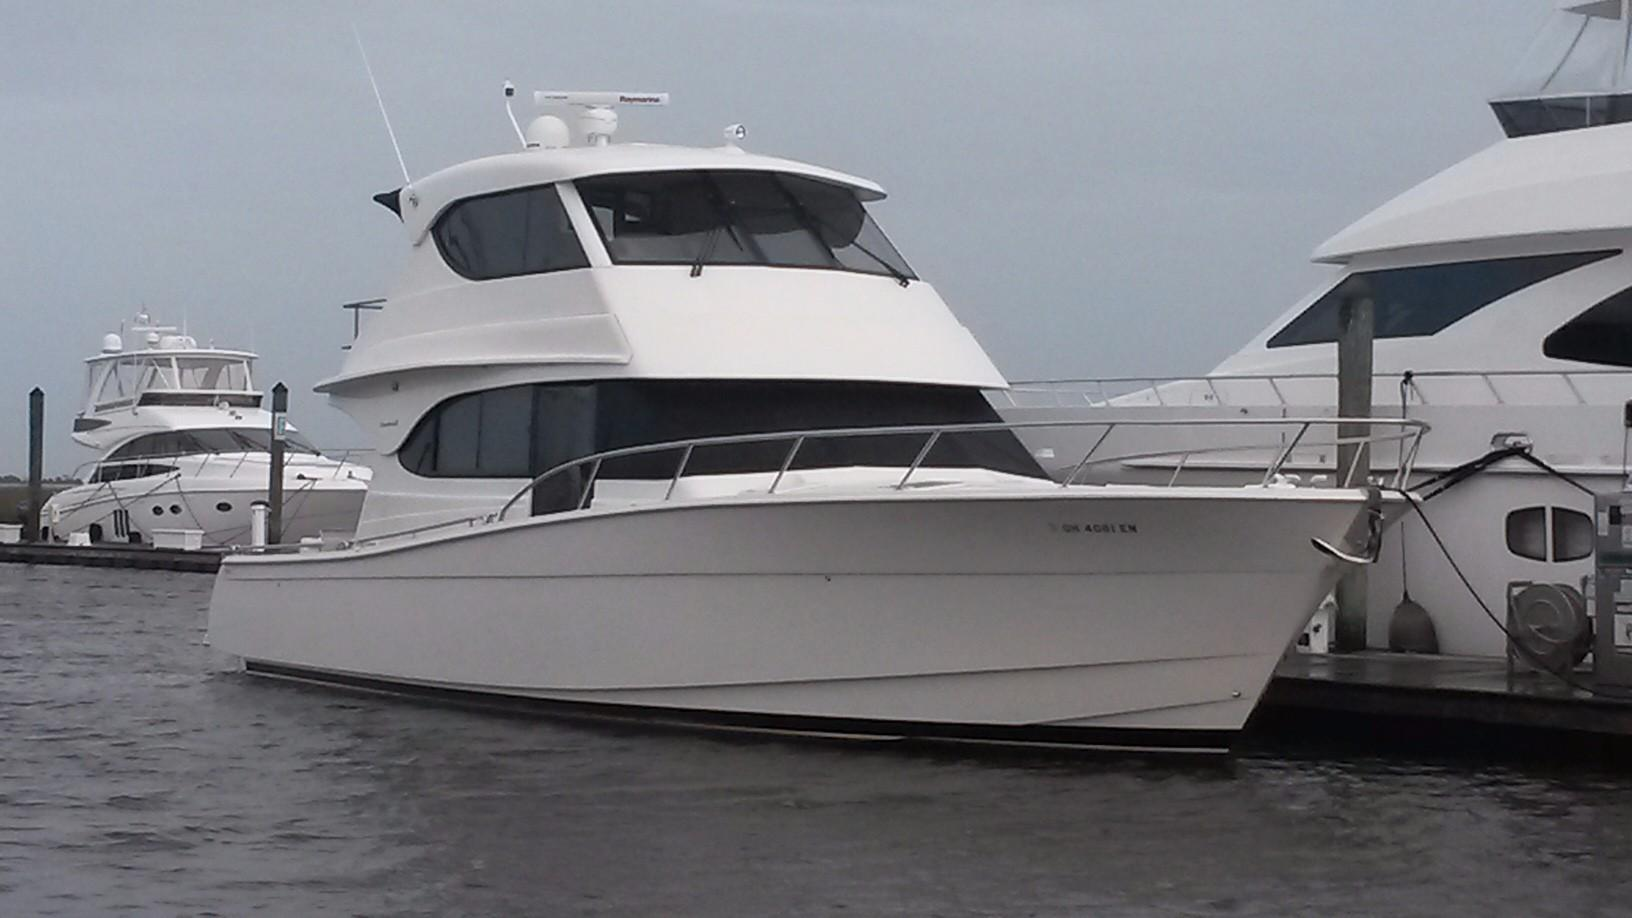 52' Maritimo Motor Yacht BELLISSIMA